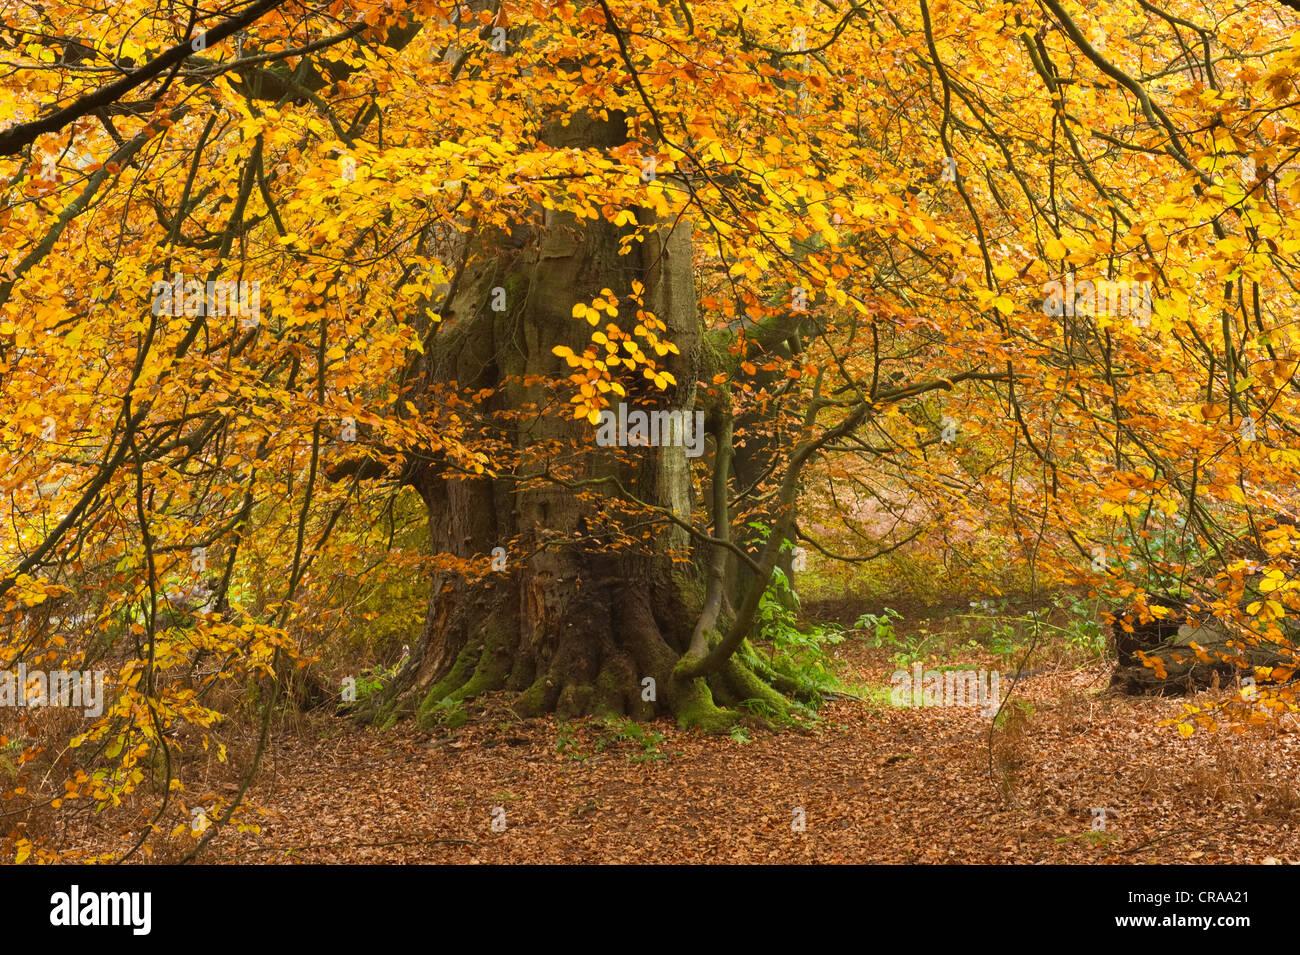 Autumnal Urwald Sababurg primeval forest, Reinhardswald, Hofgeismar, North Hesse, Germany, Europe - Stock Image